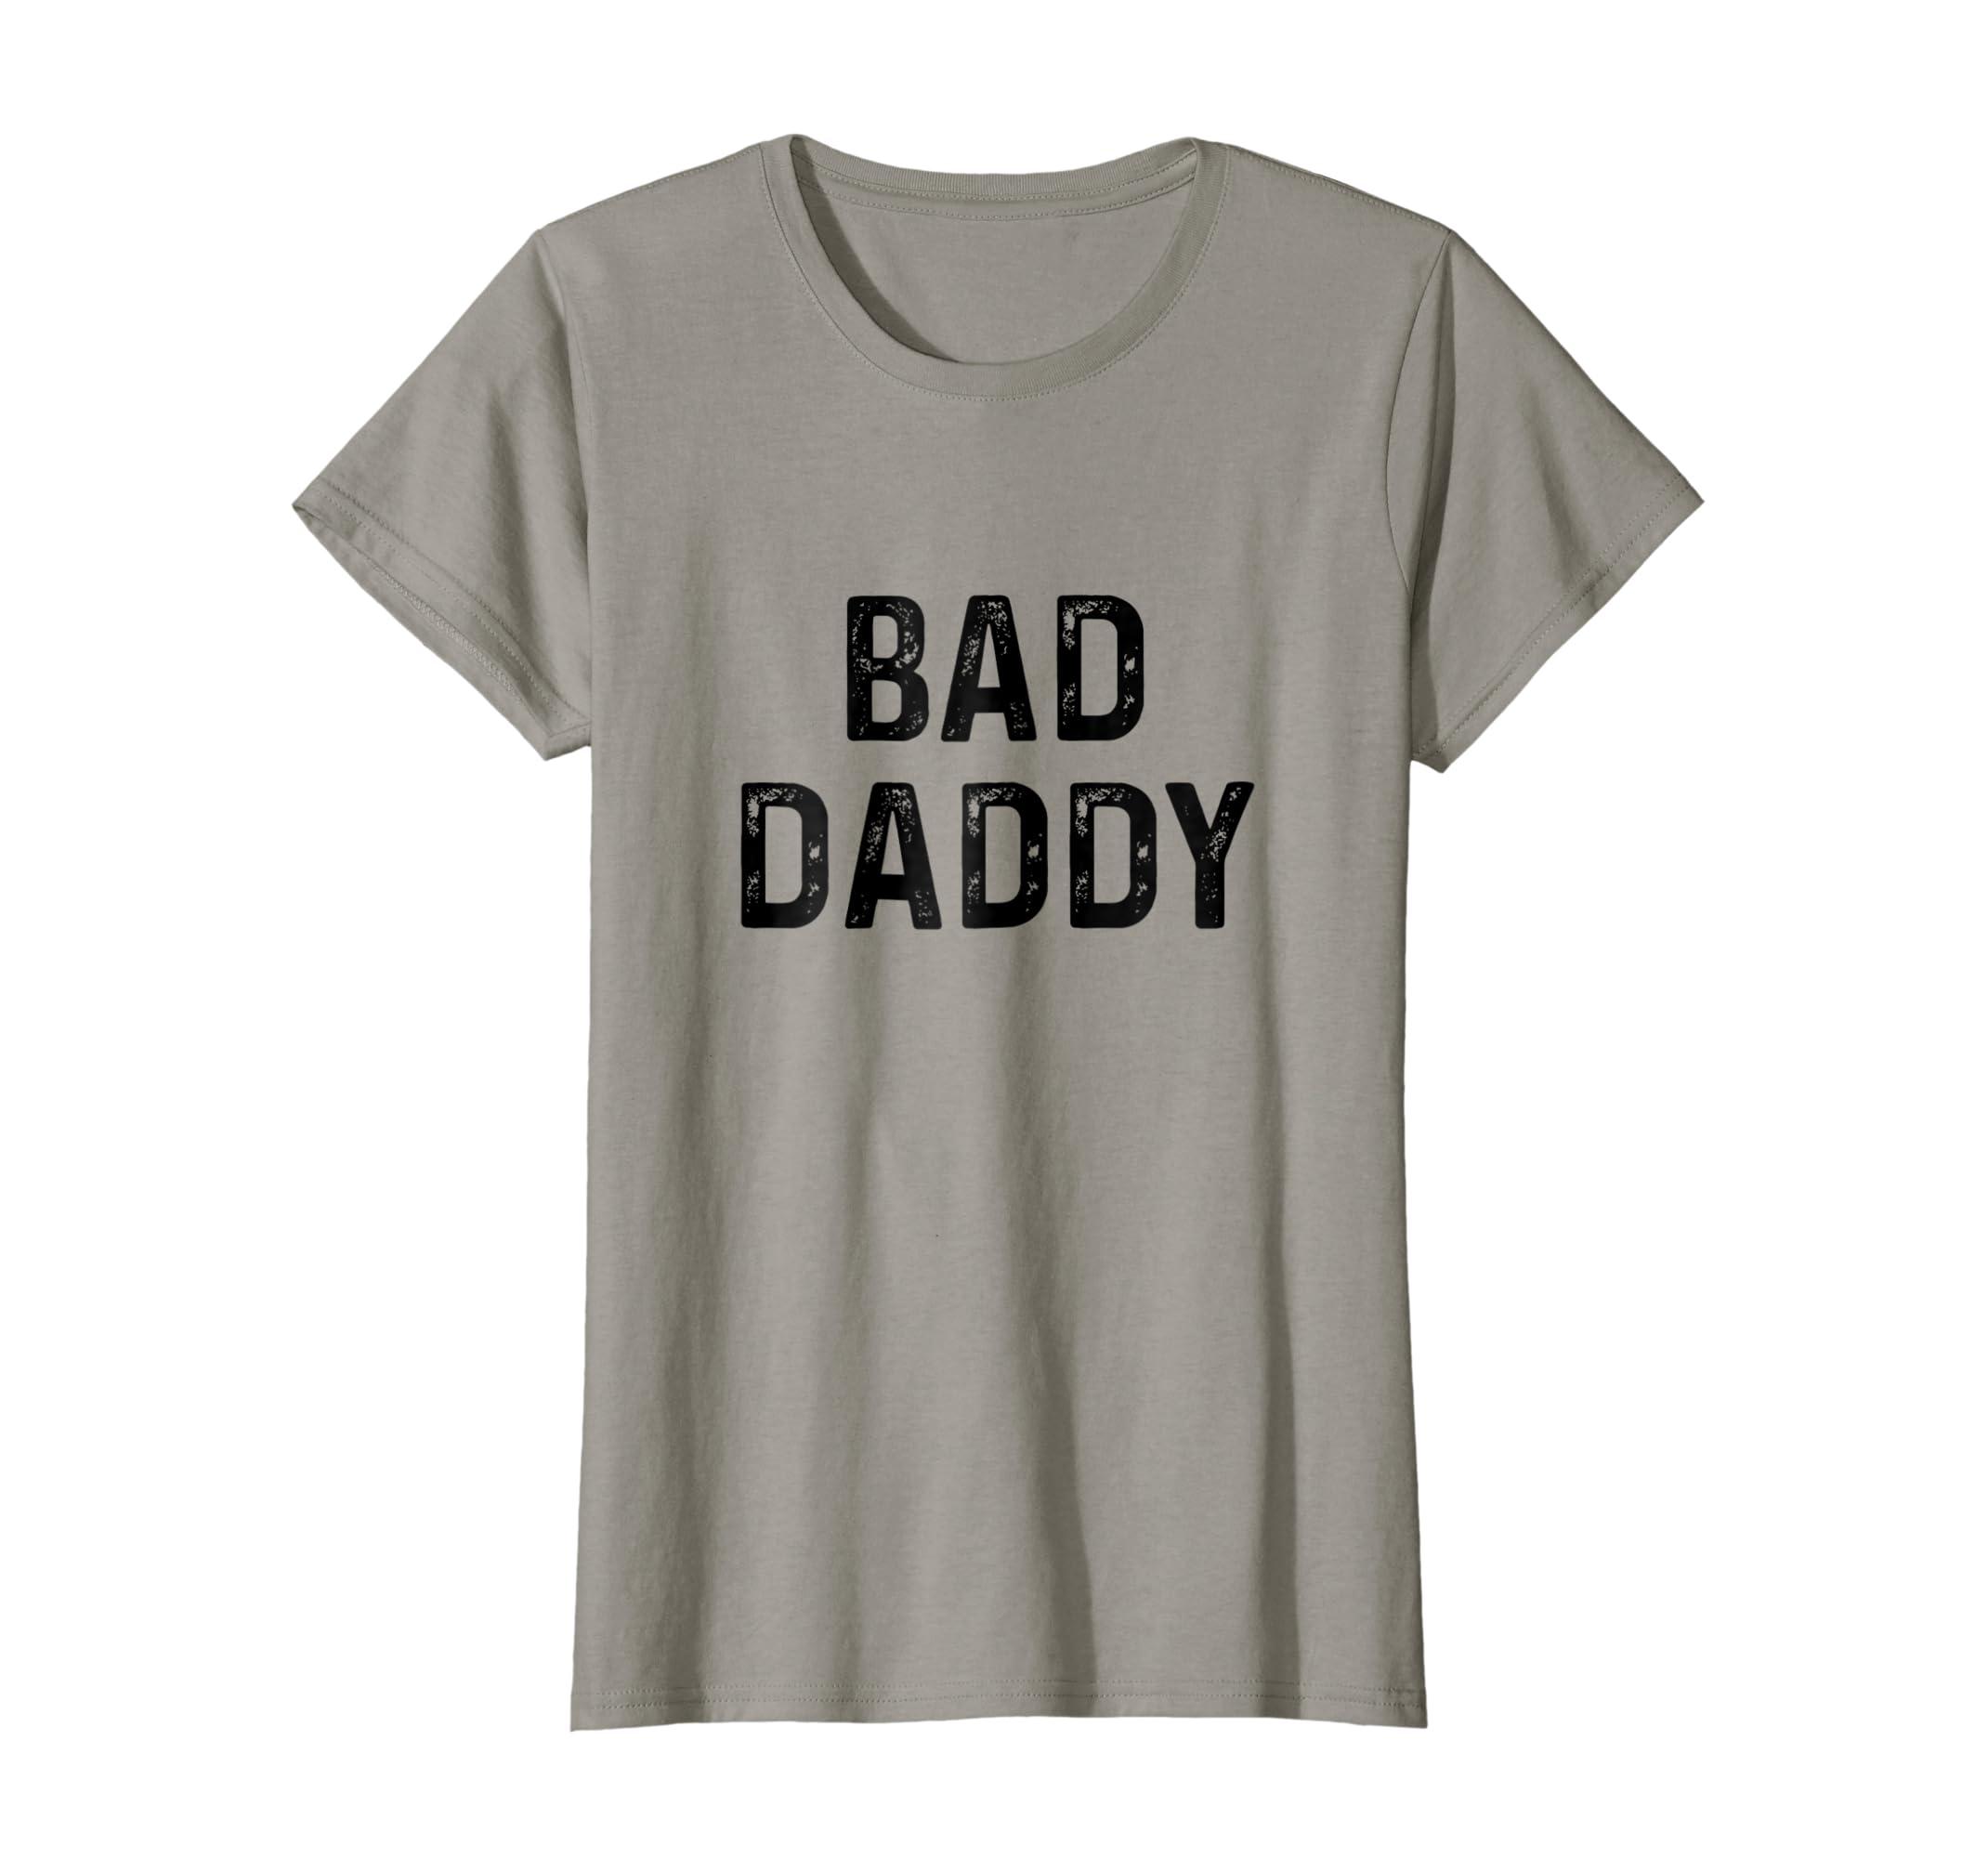 89e8563a Amazon.com: Bad Daddy | Naughty Funny BDSM Sub Kink Tee Shirt: Clothing